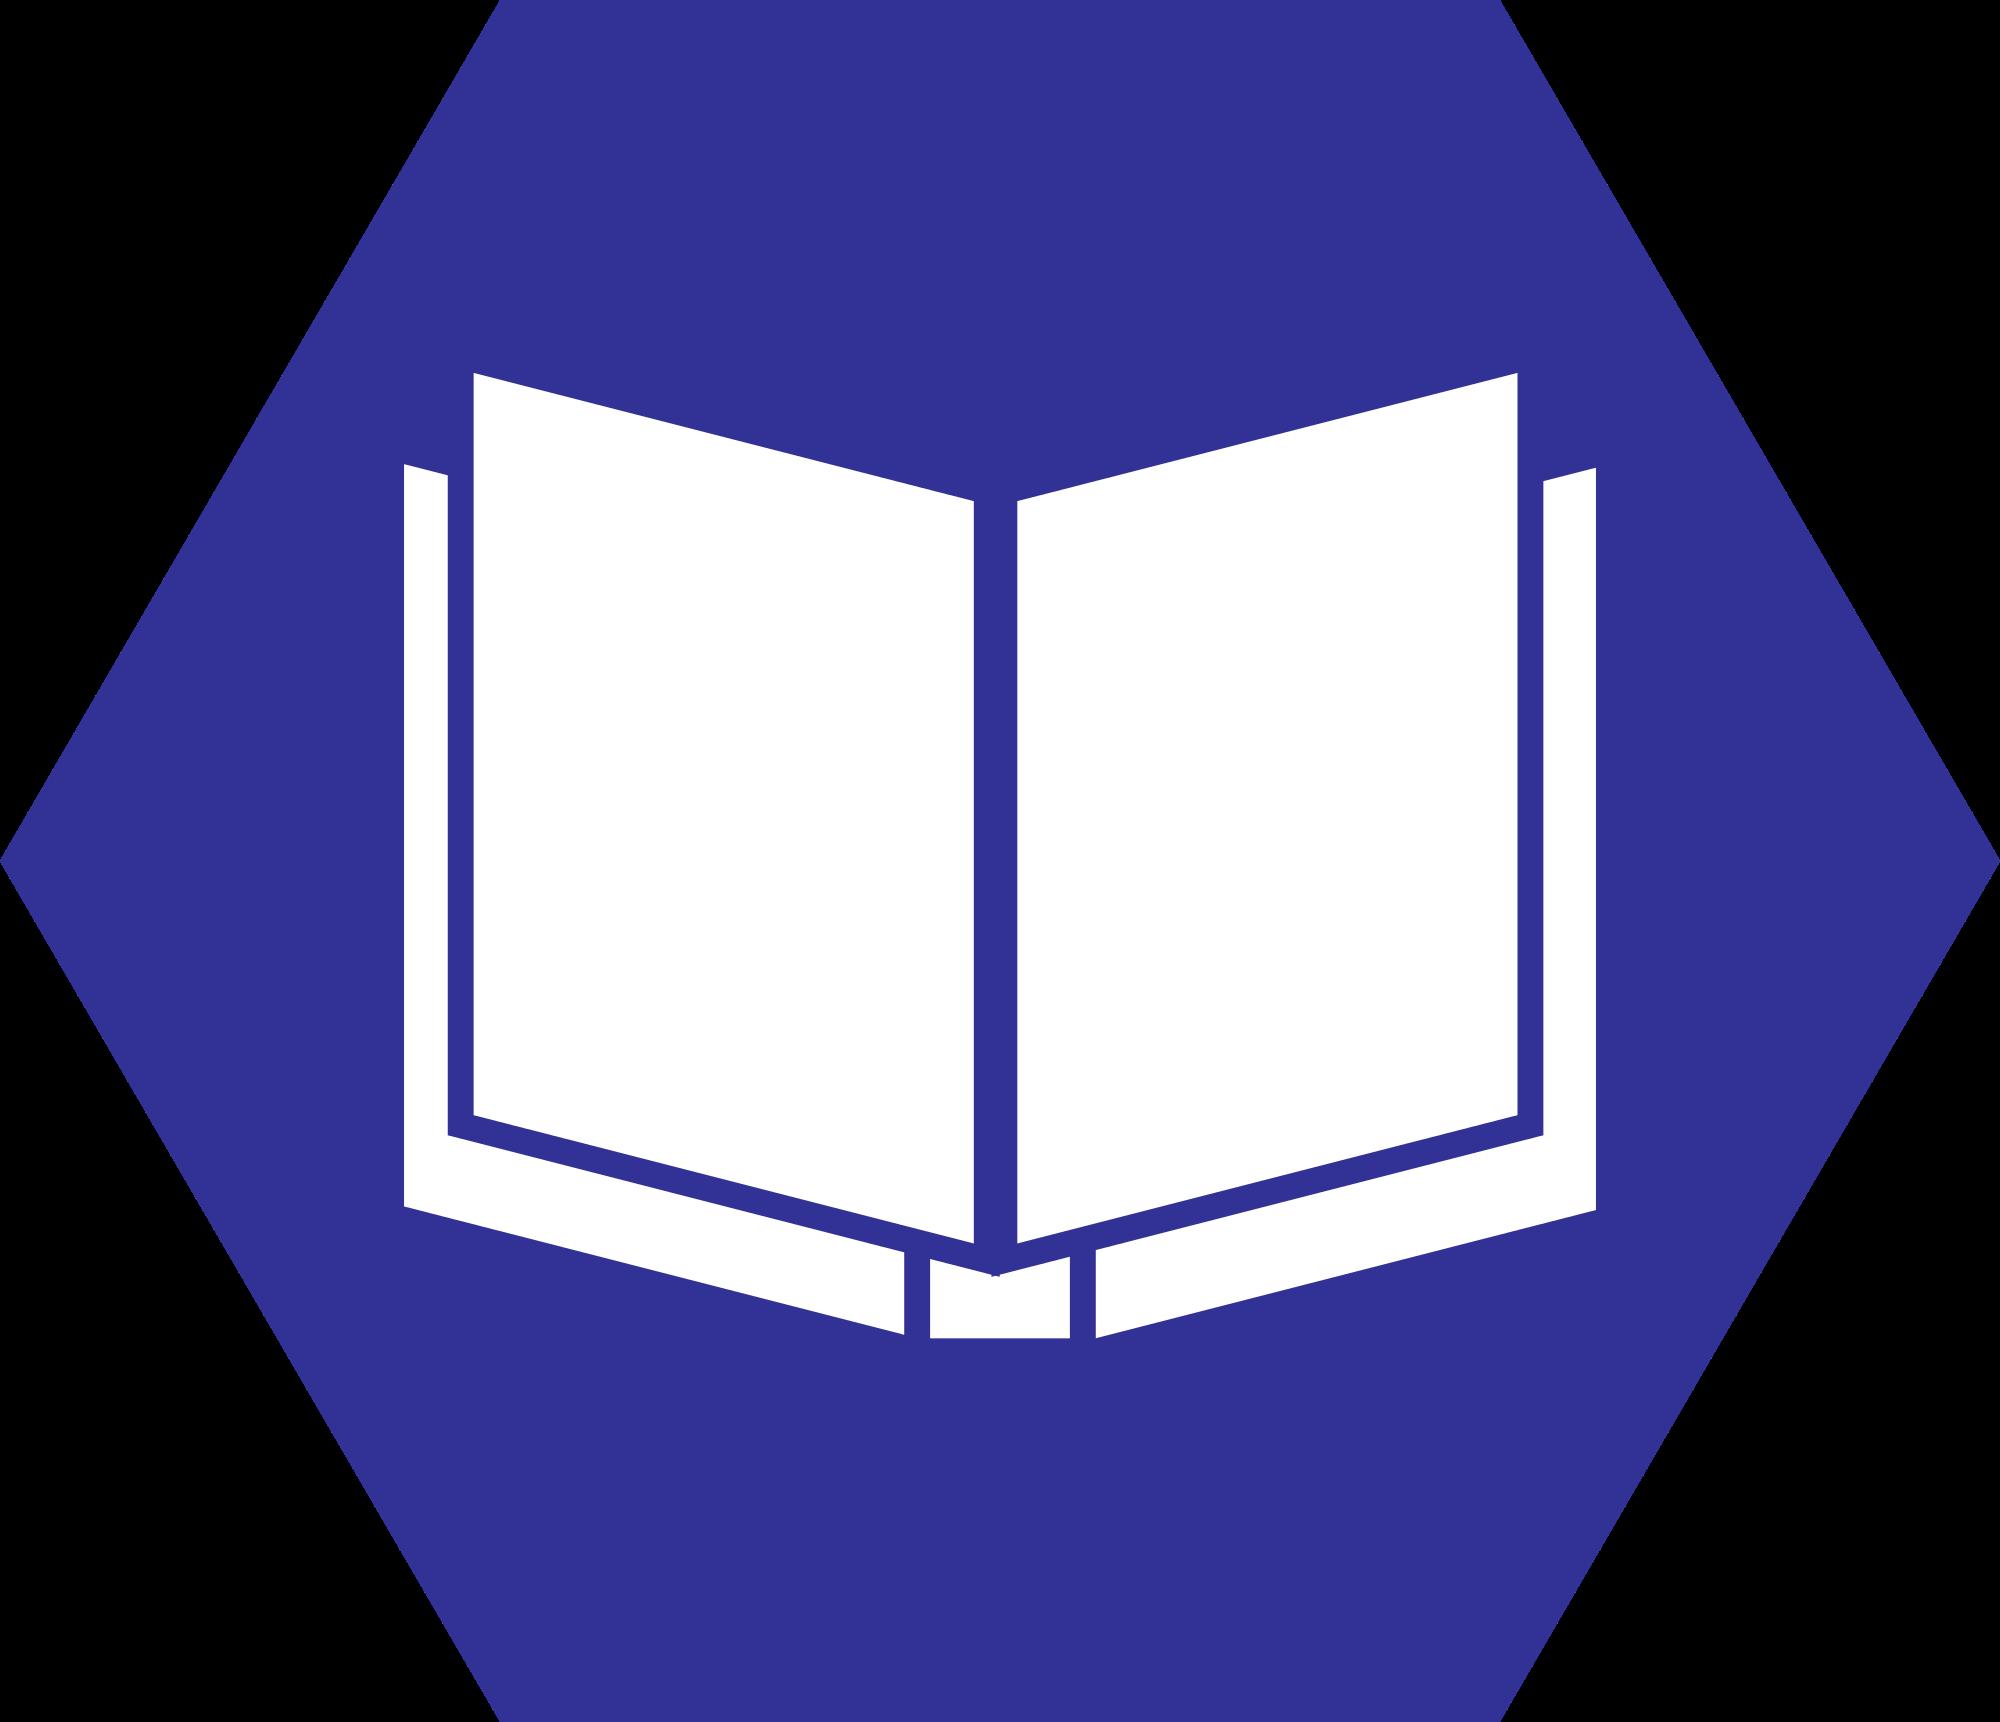 banner transparent download File book hexagonal icon. Books svg bitmap